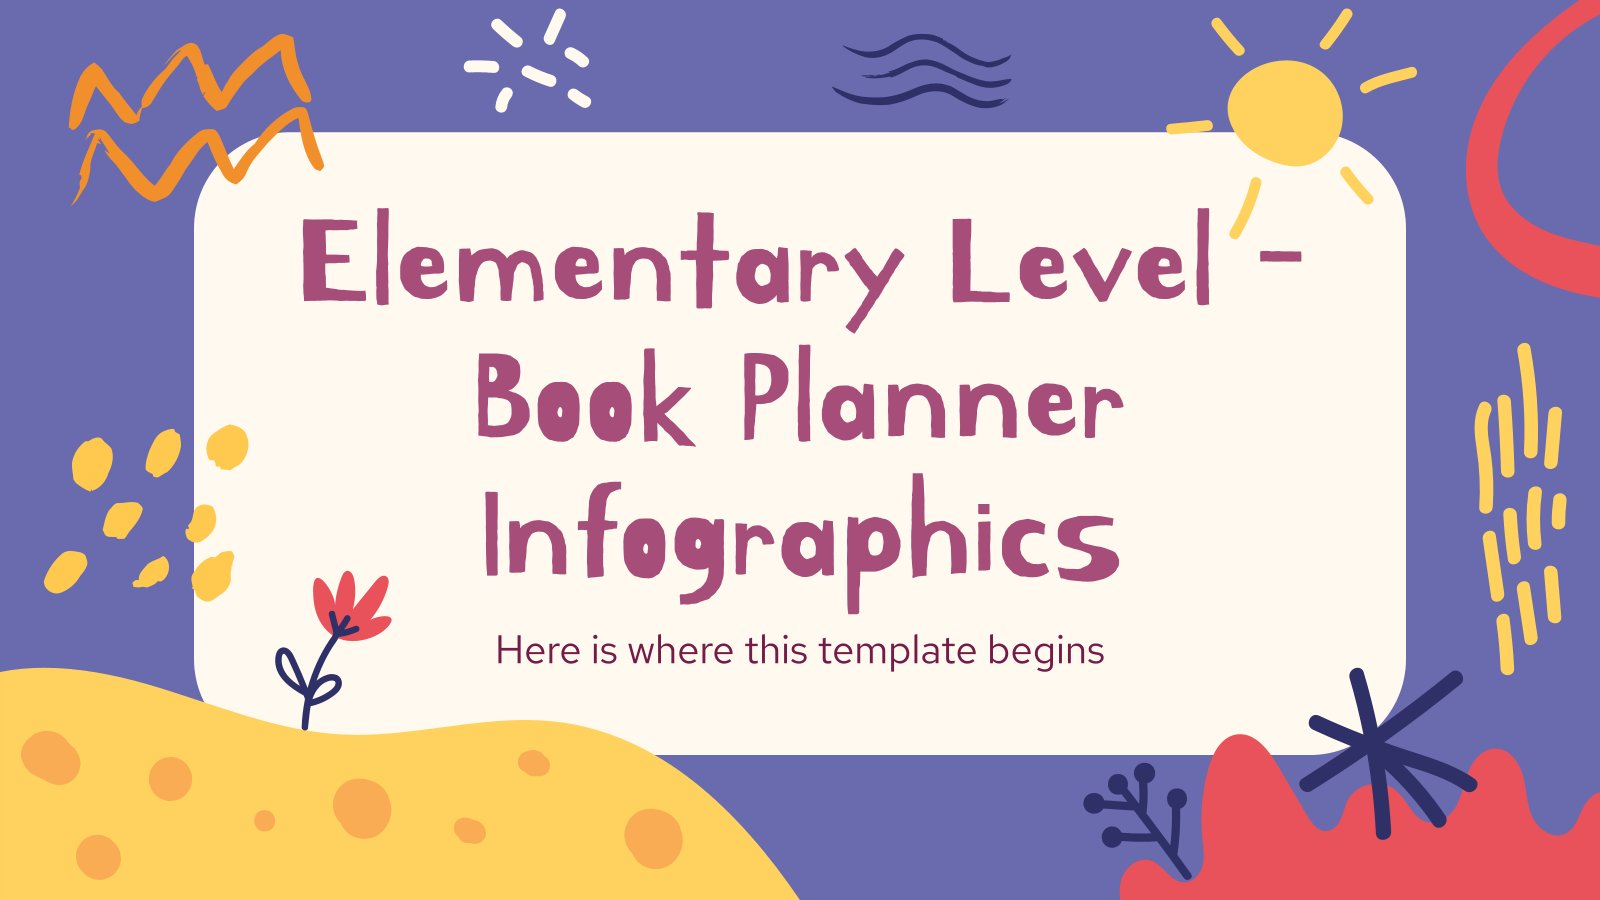 Elementarstufe - Buchplaner Infografiken Präsentationsvorlage